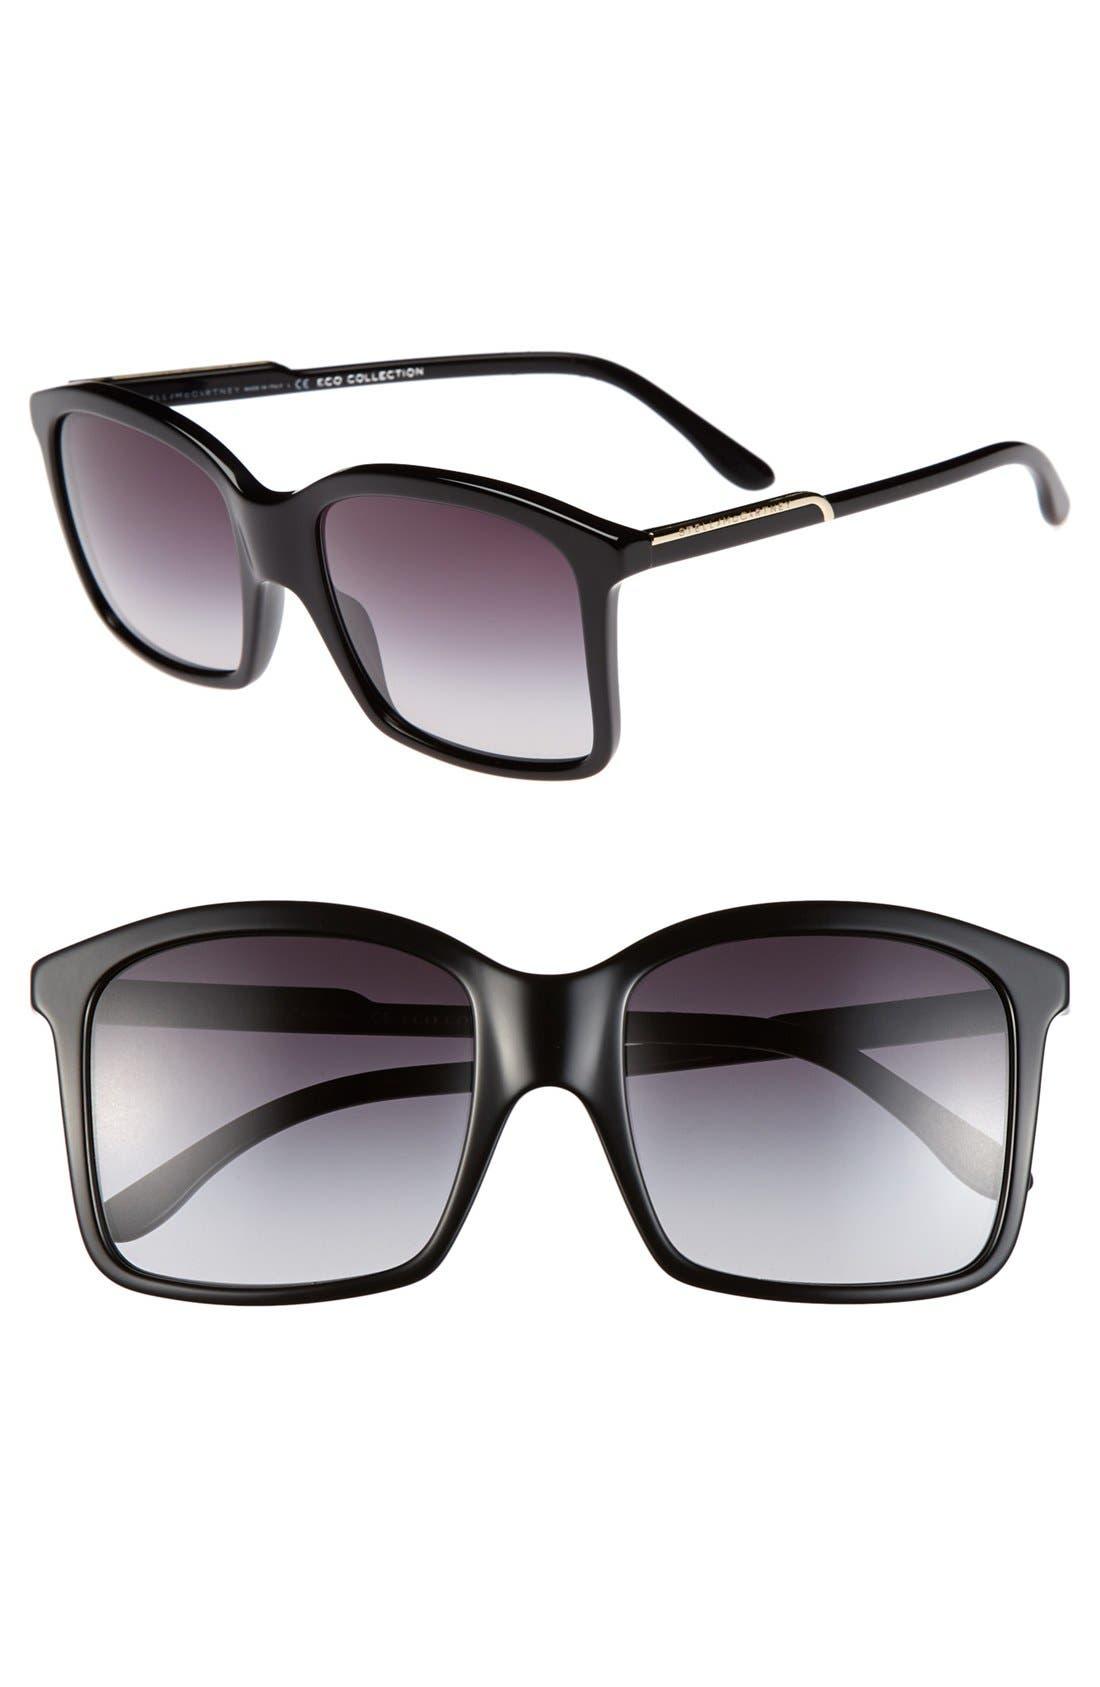 54mm Oversized Sunglasses,                             Main thumbnail 1, color,                             001